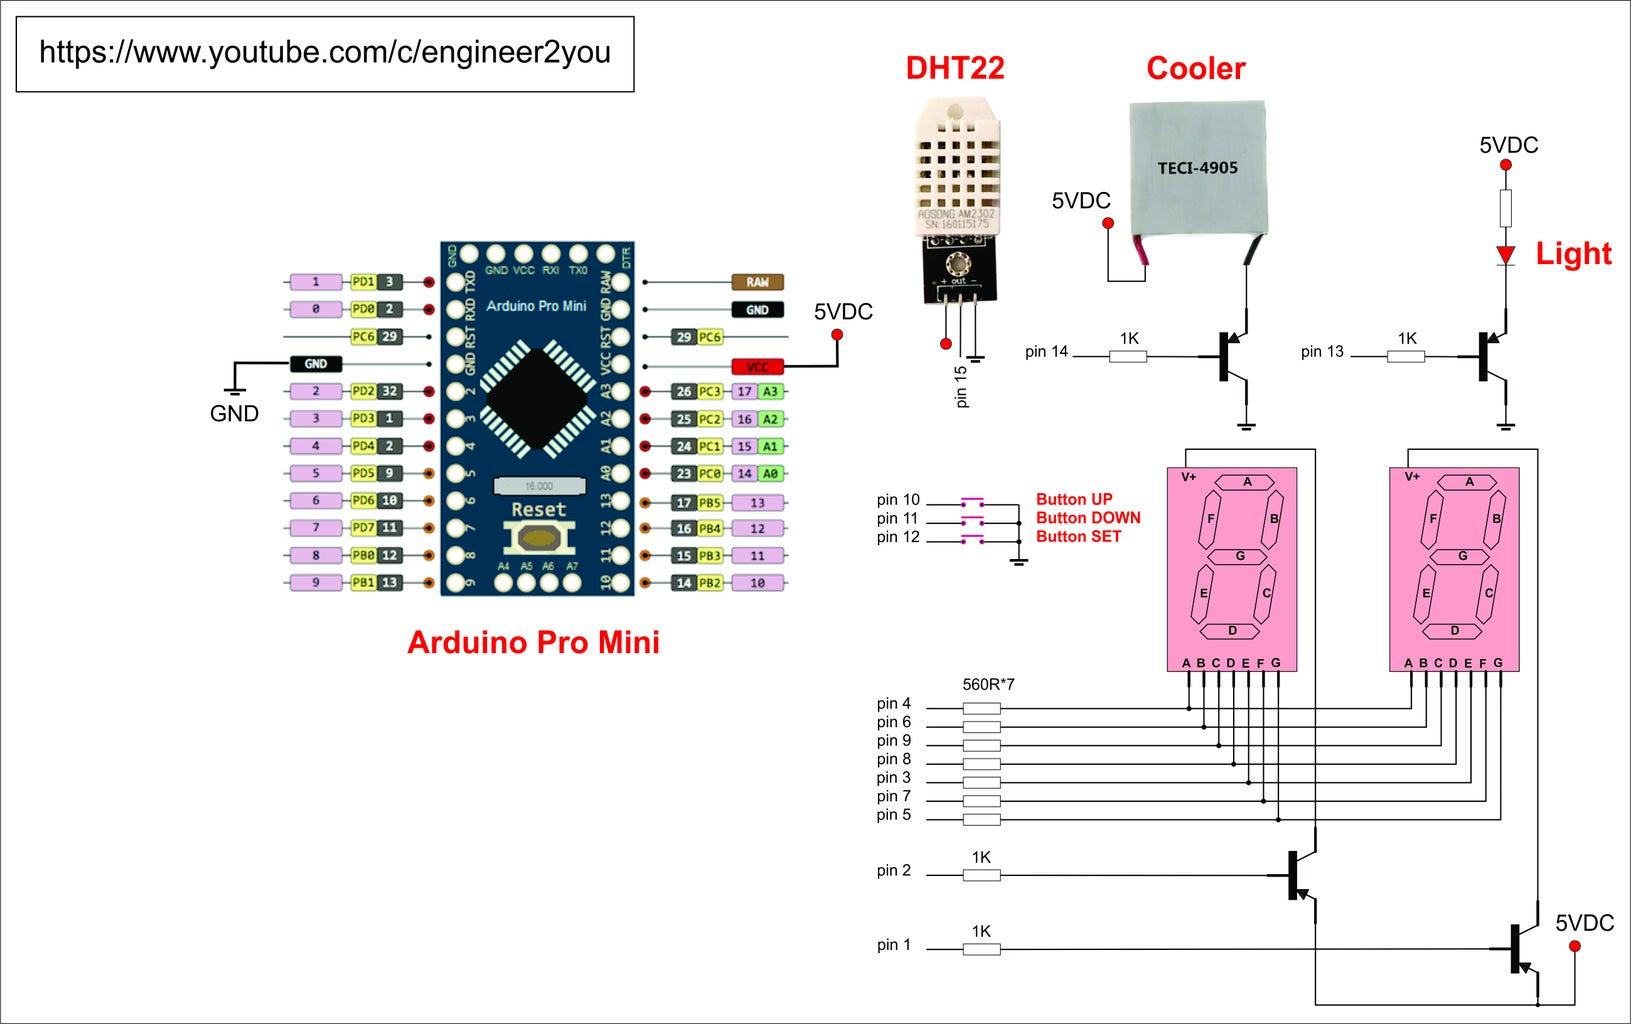 Connect Humid Sensor and Control Humid